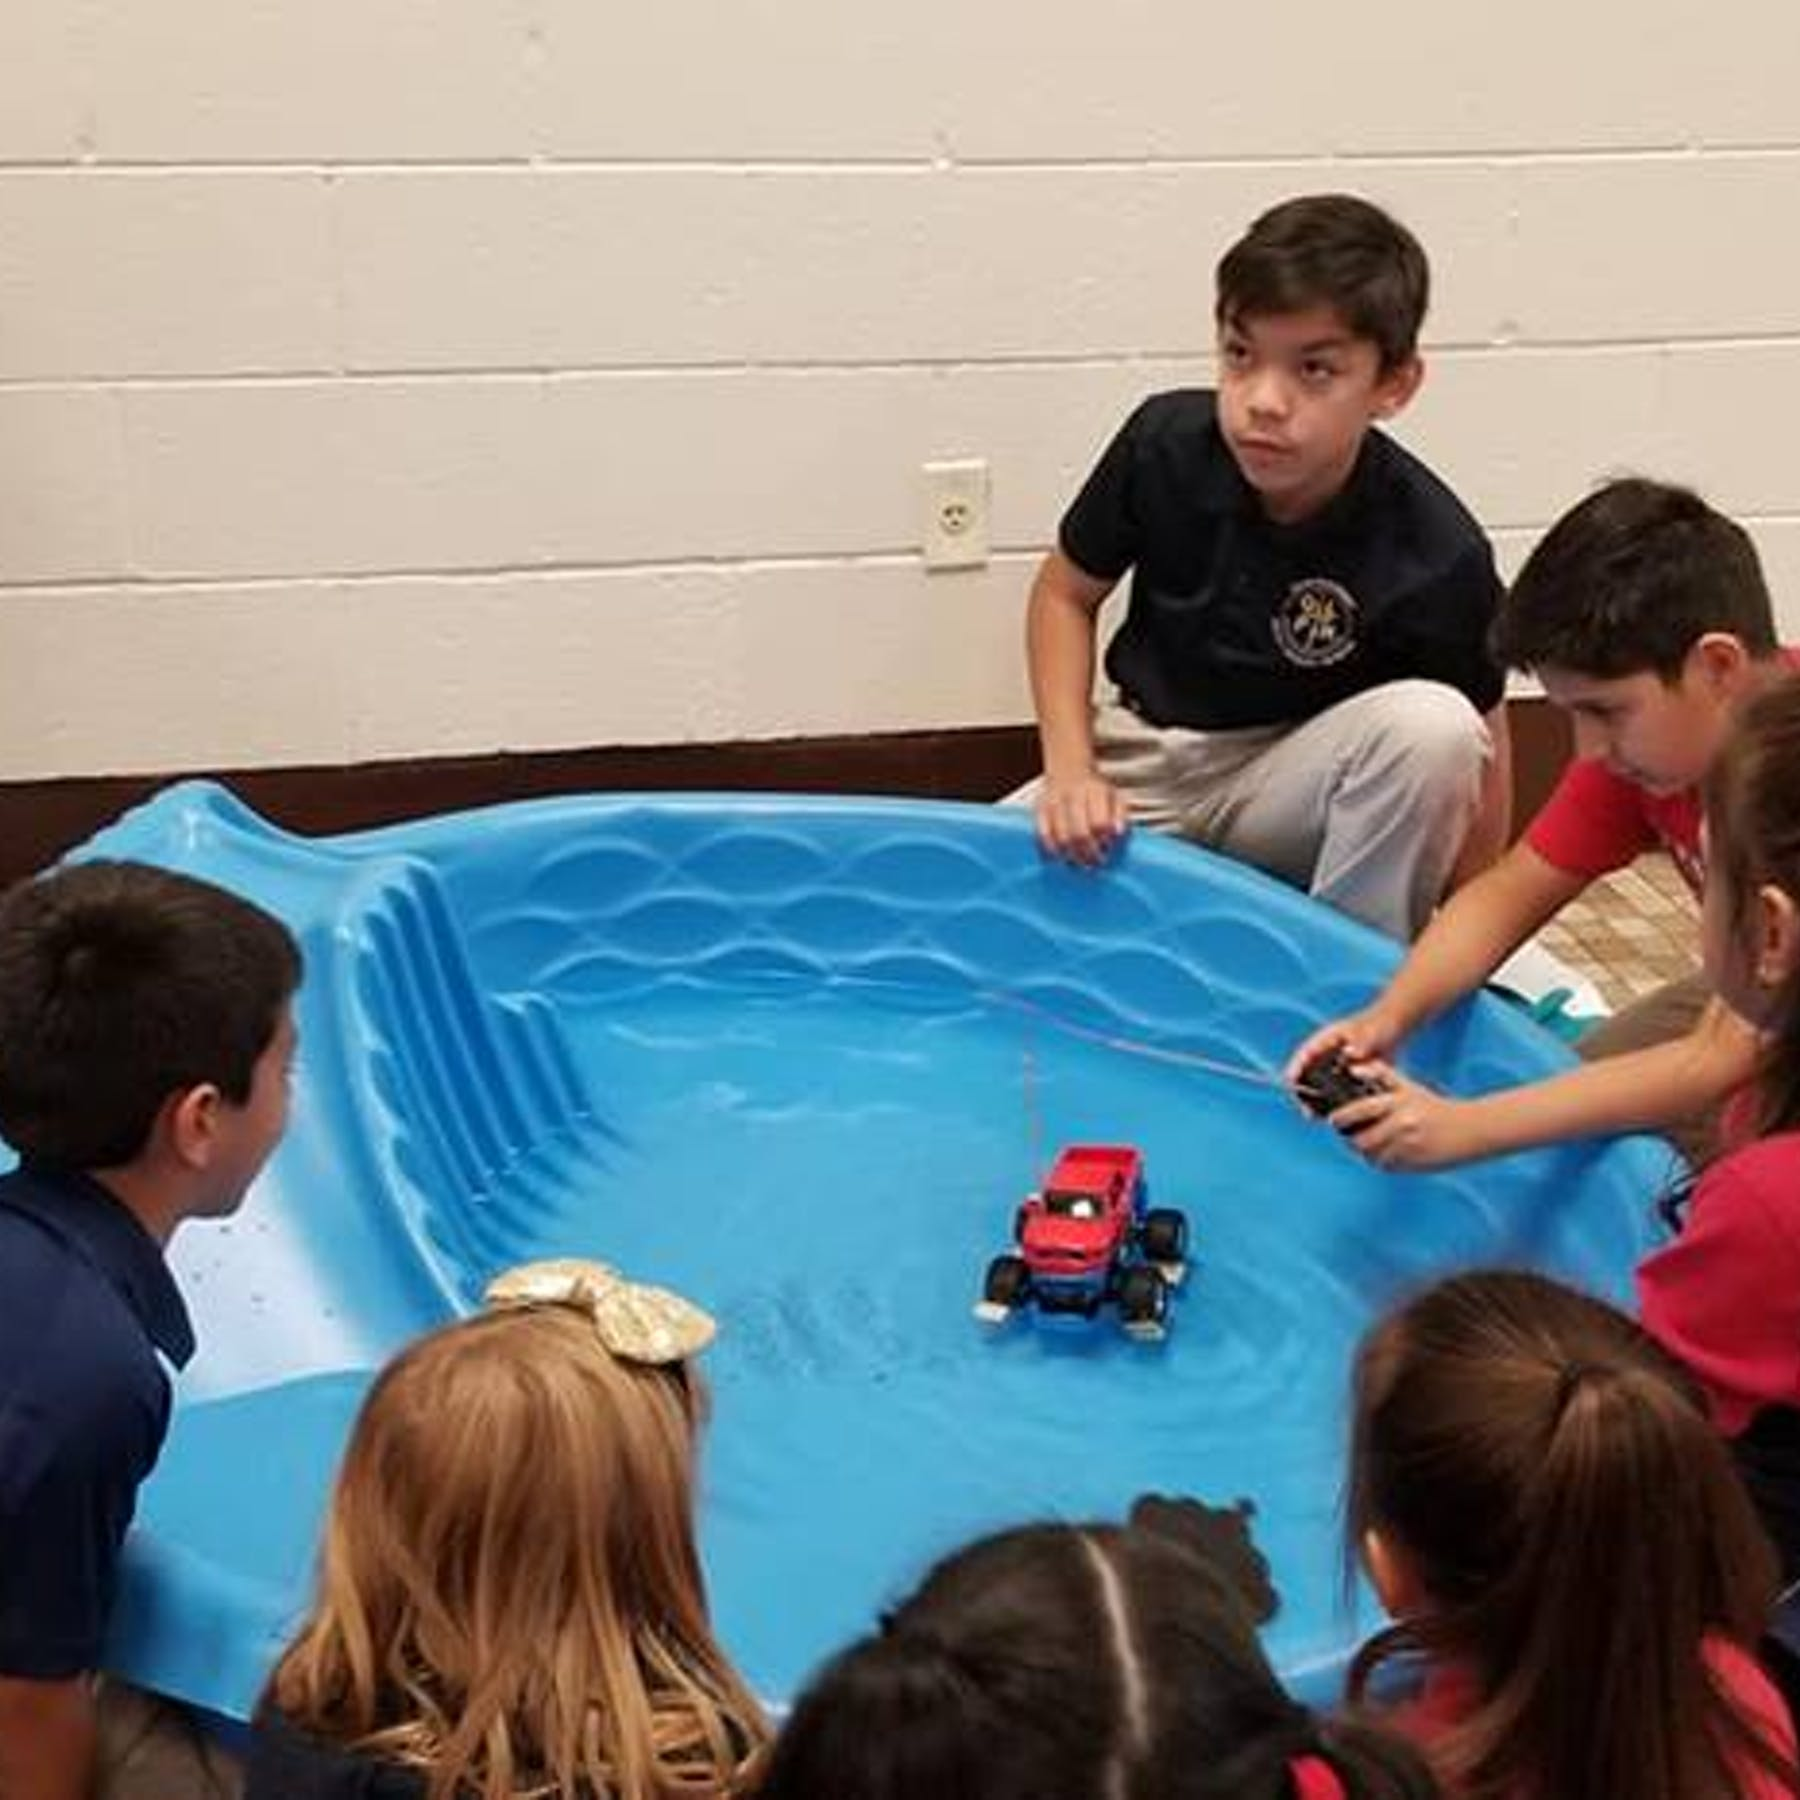 Our Lady Of Perpetual Help School - Preschool in Corpus Christi, TX - Winnie